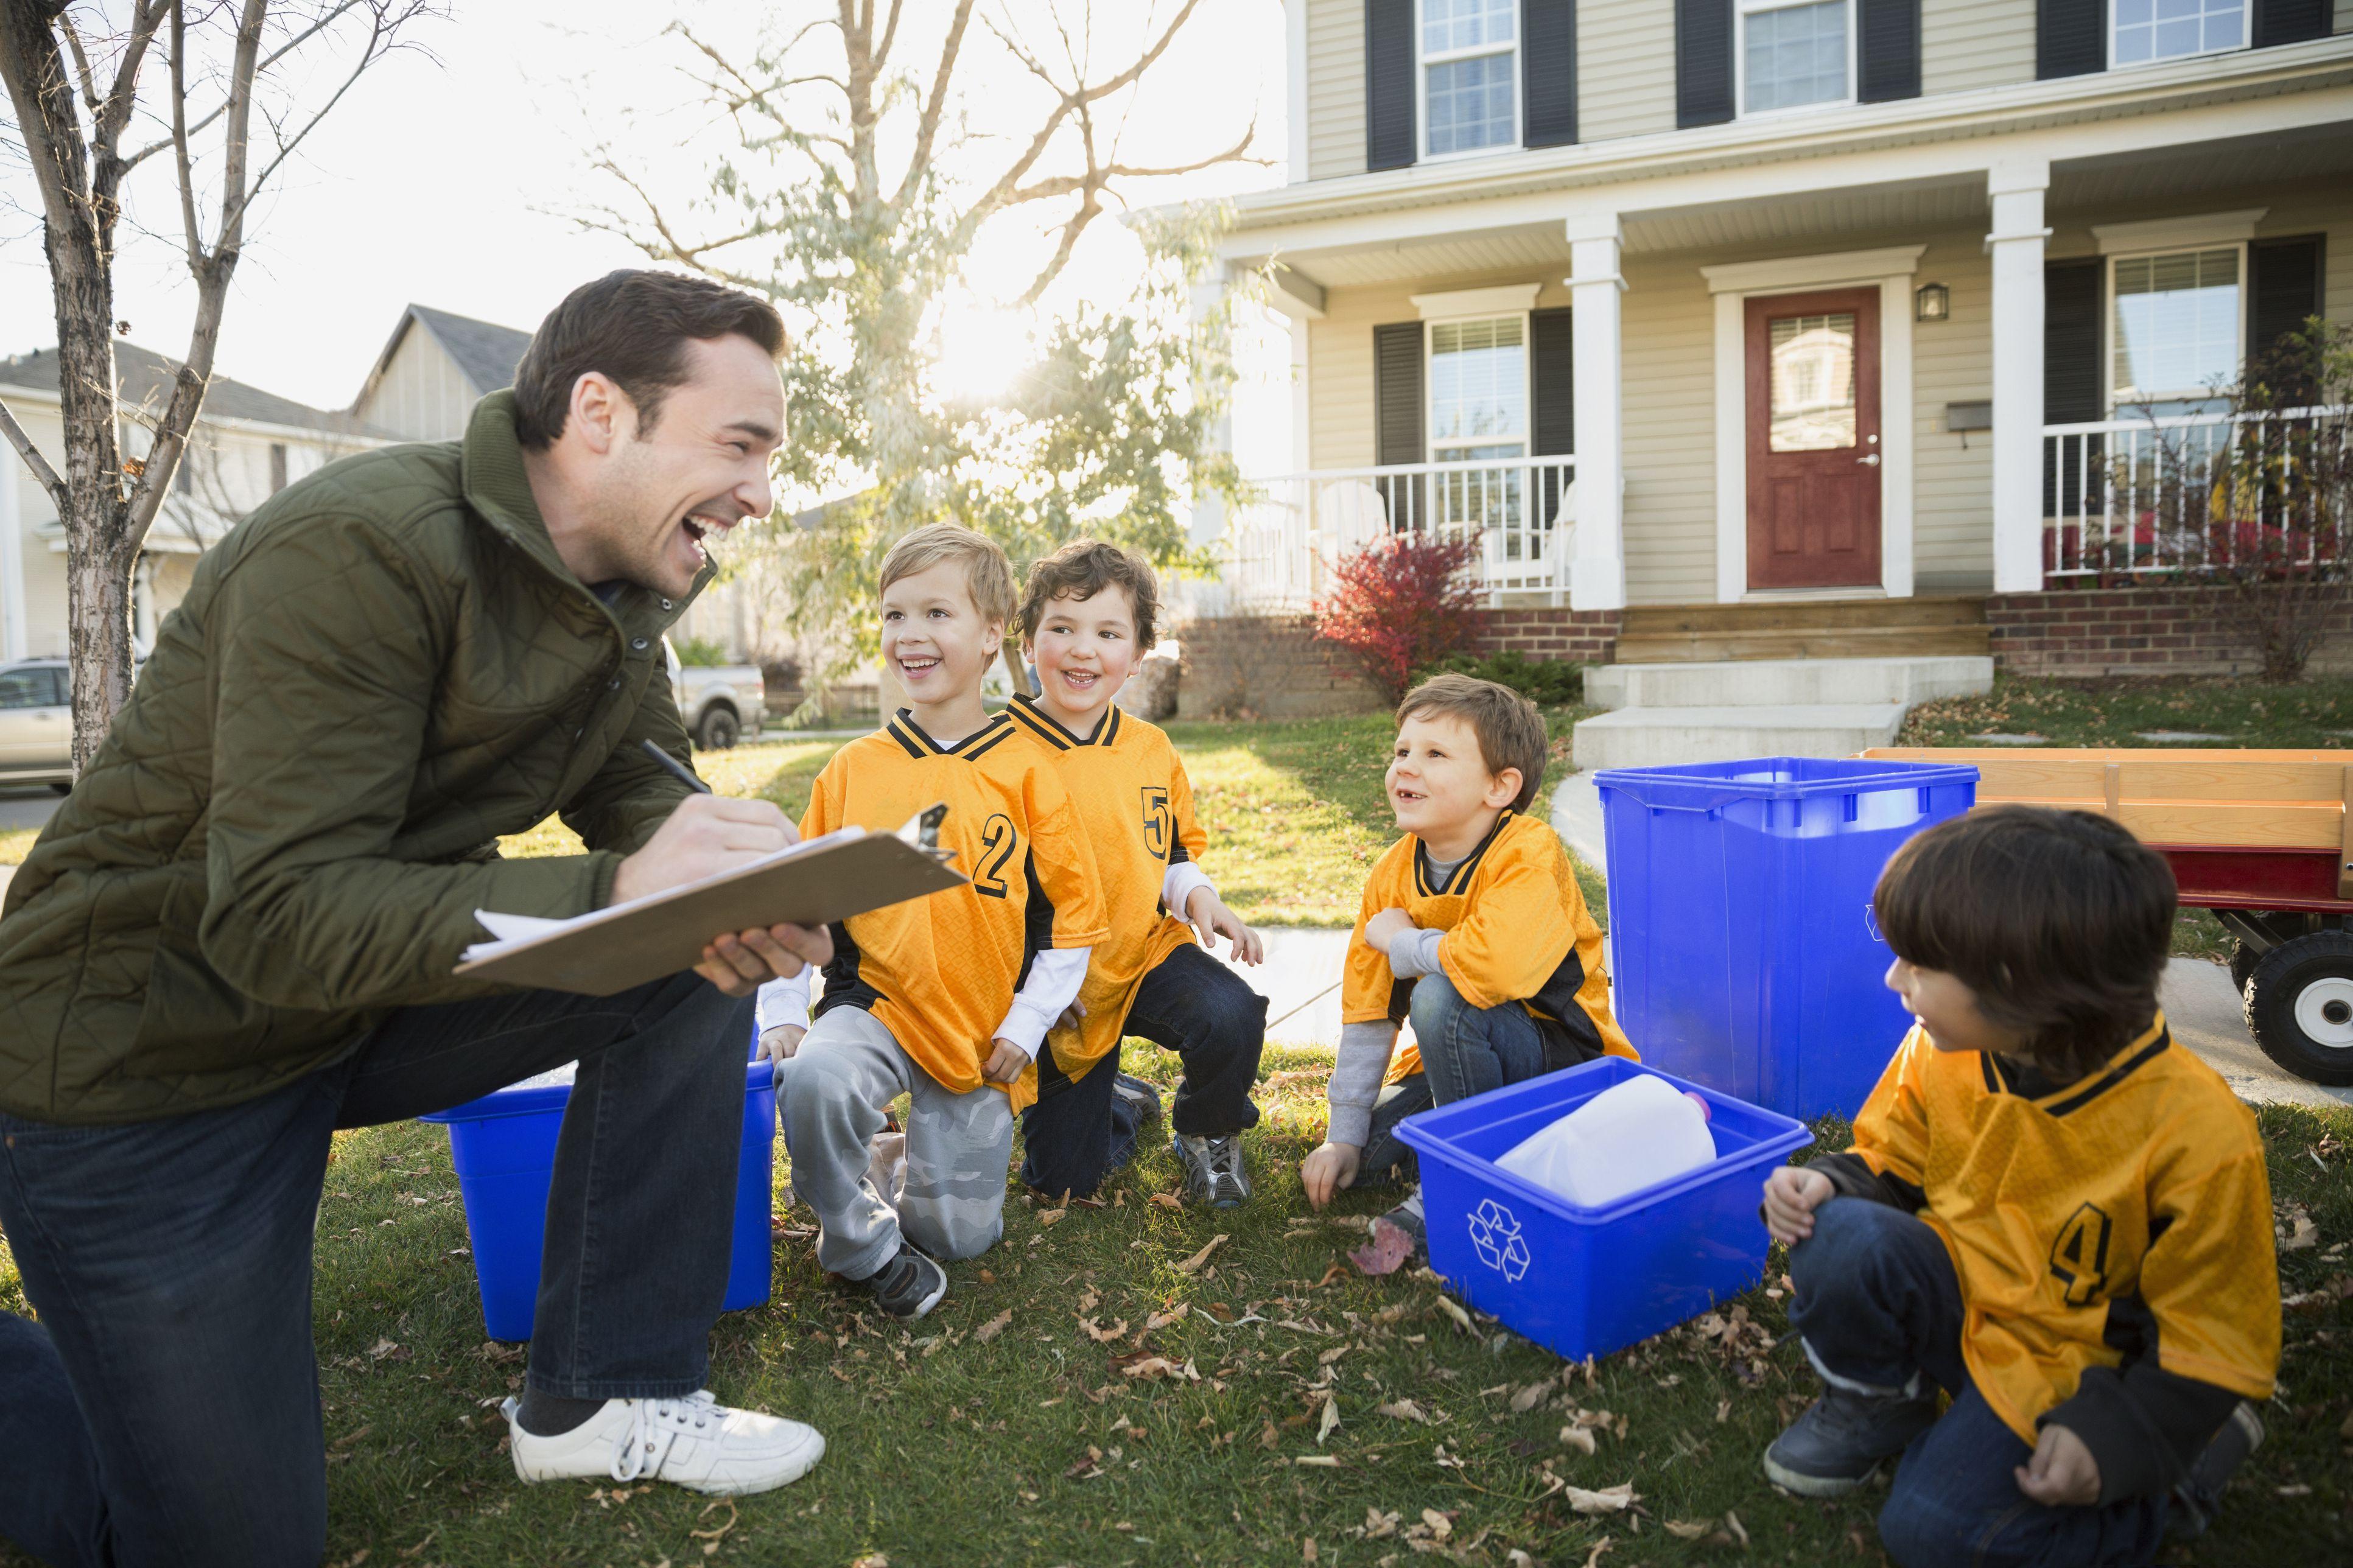 Coach and boys sports team gathering recycling neighborhood